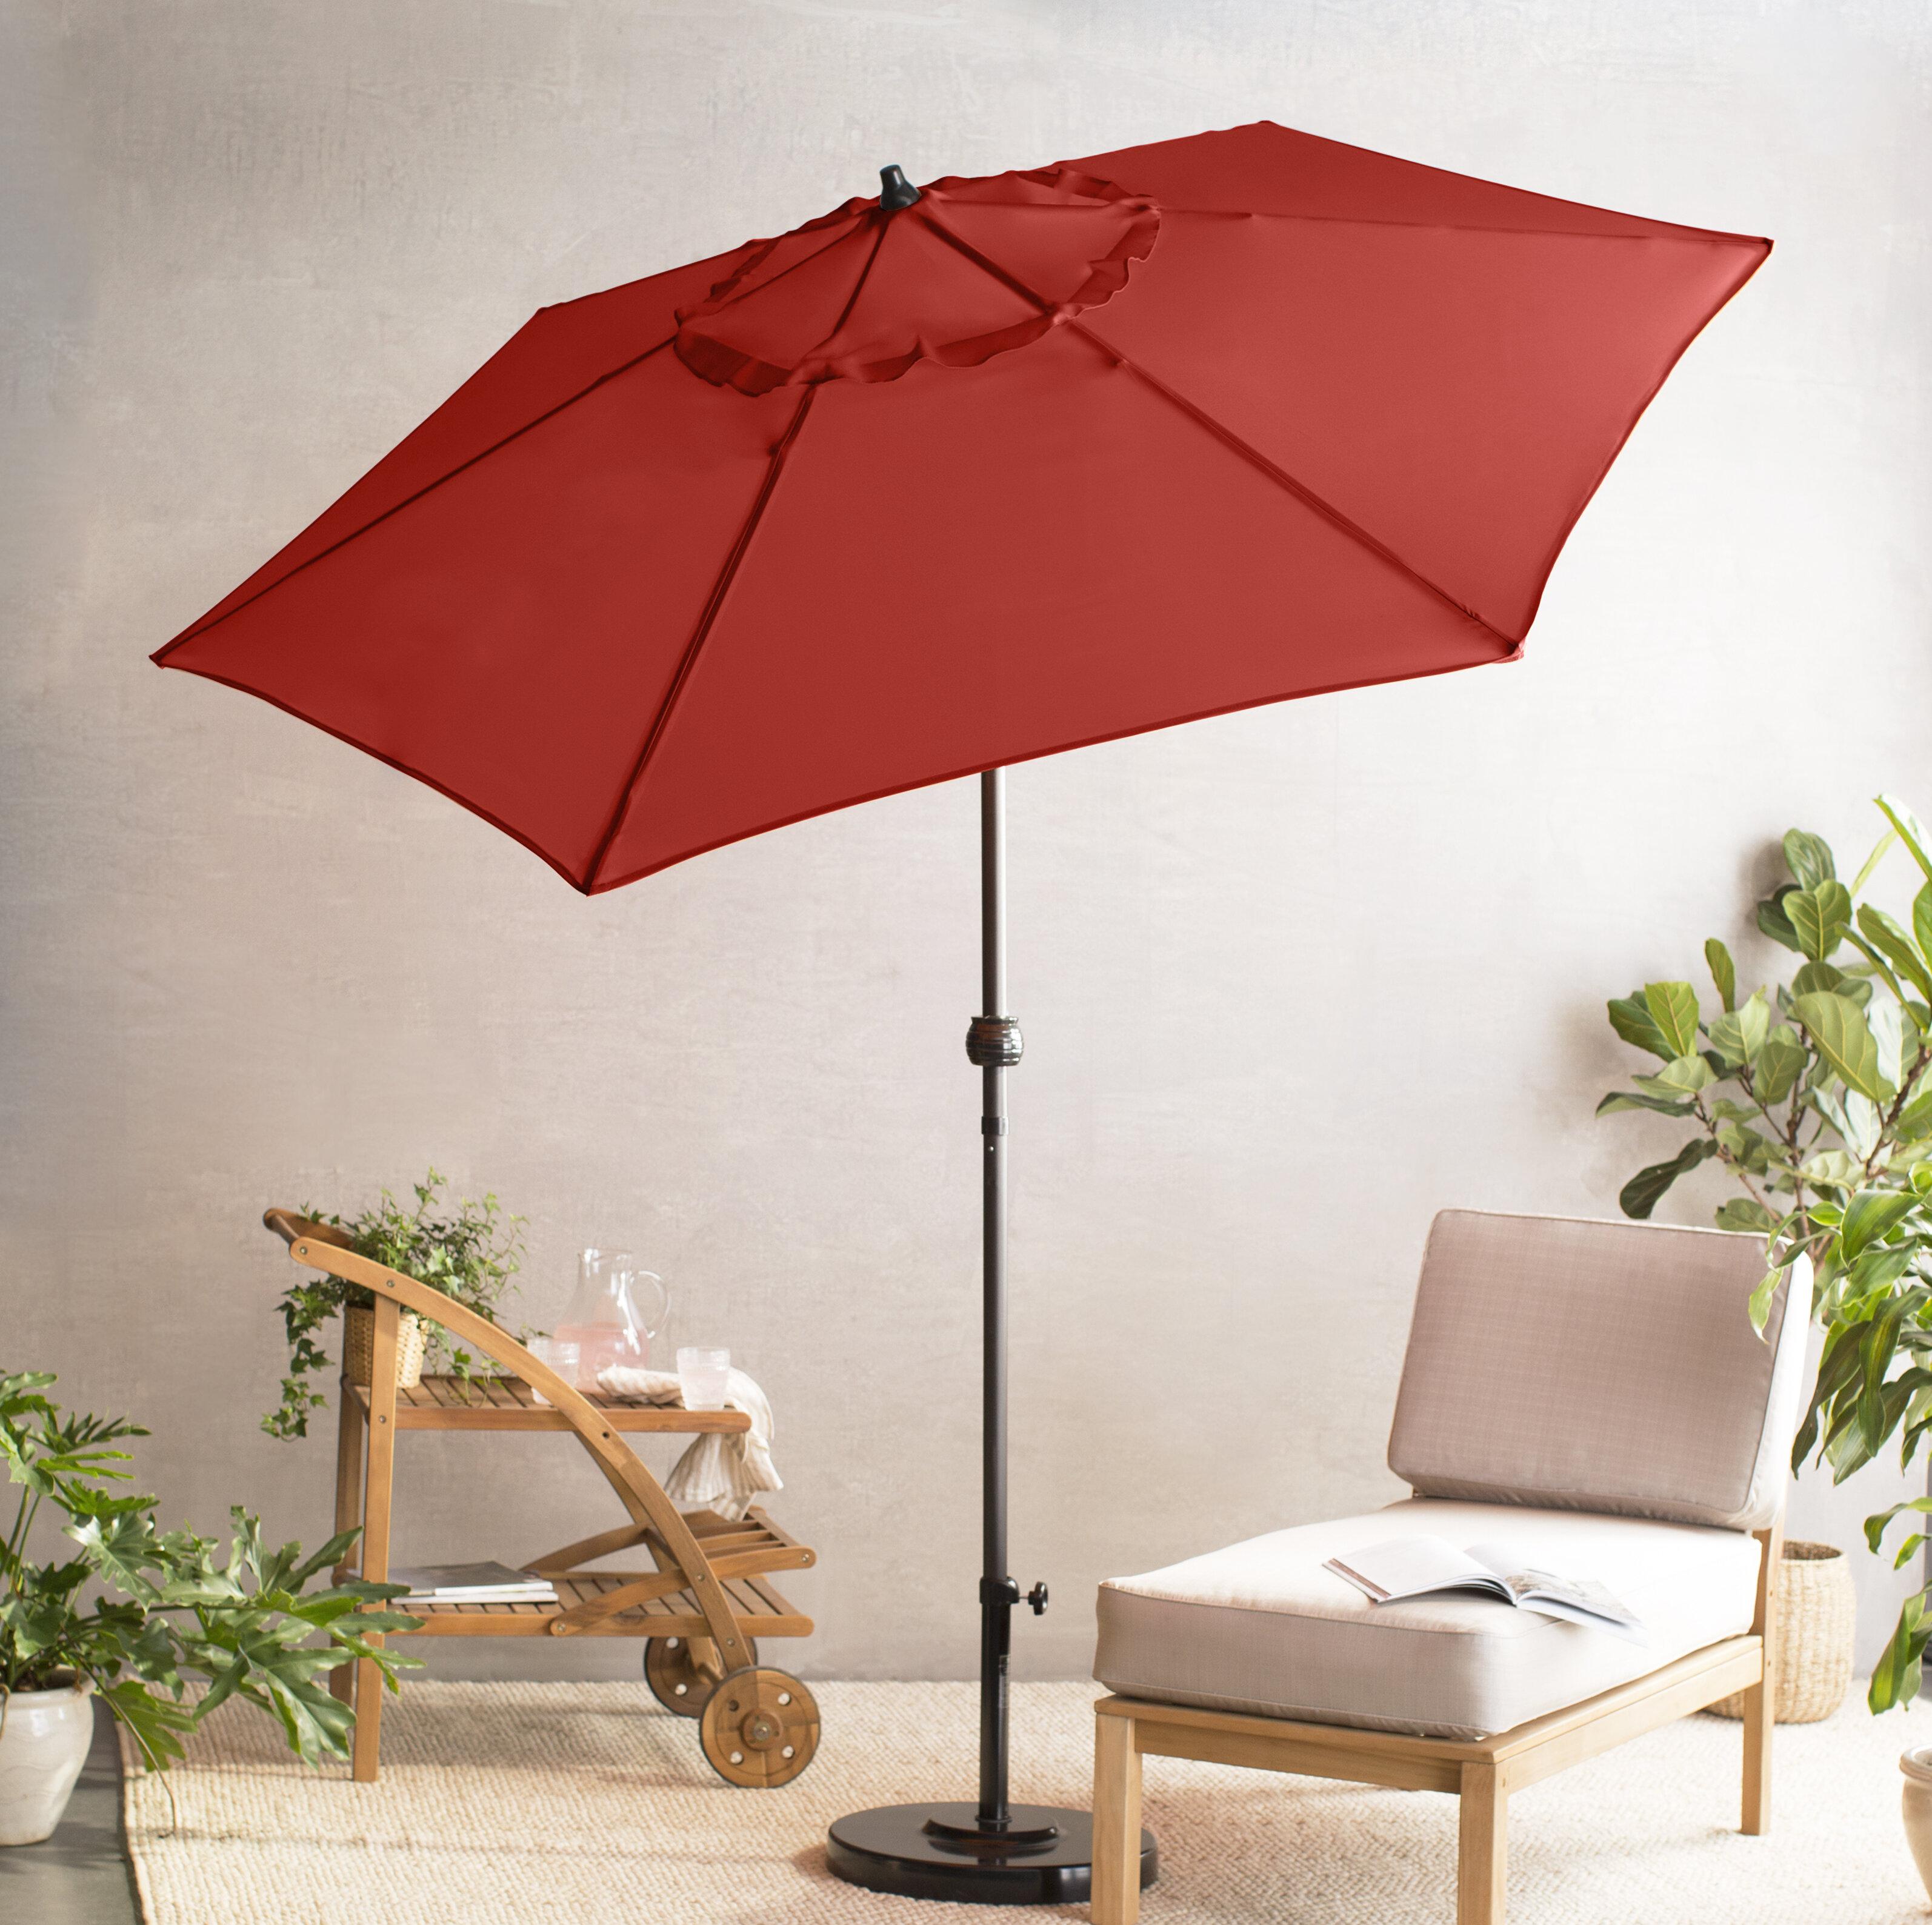 kearney 9' market umbrella